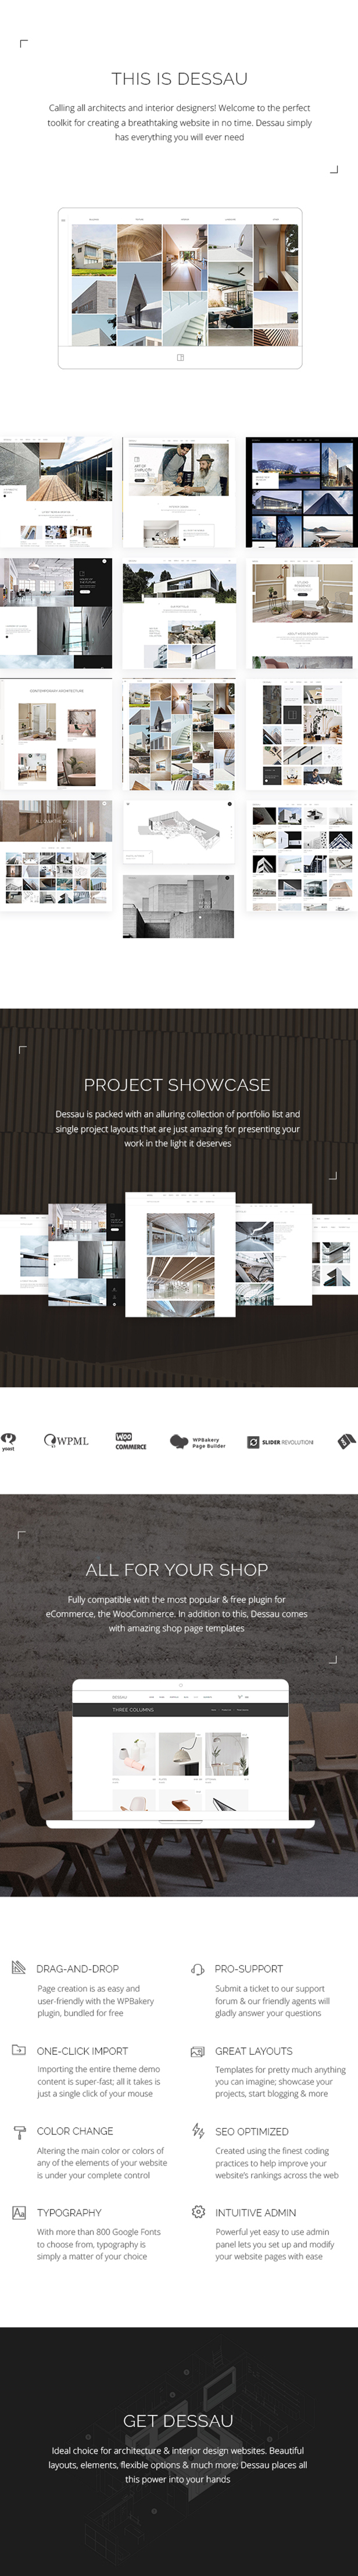 Dessau - Contemporary Theme for Architects and Interior Designers - 1